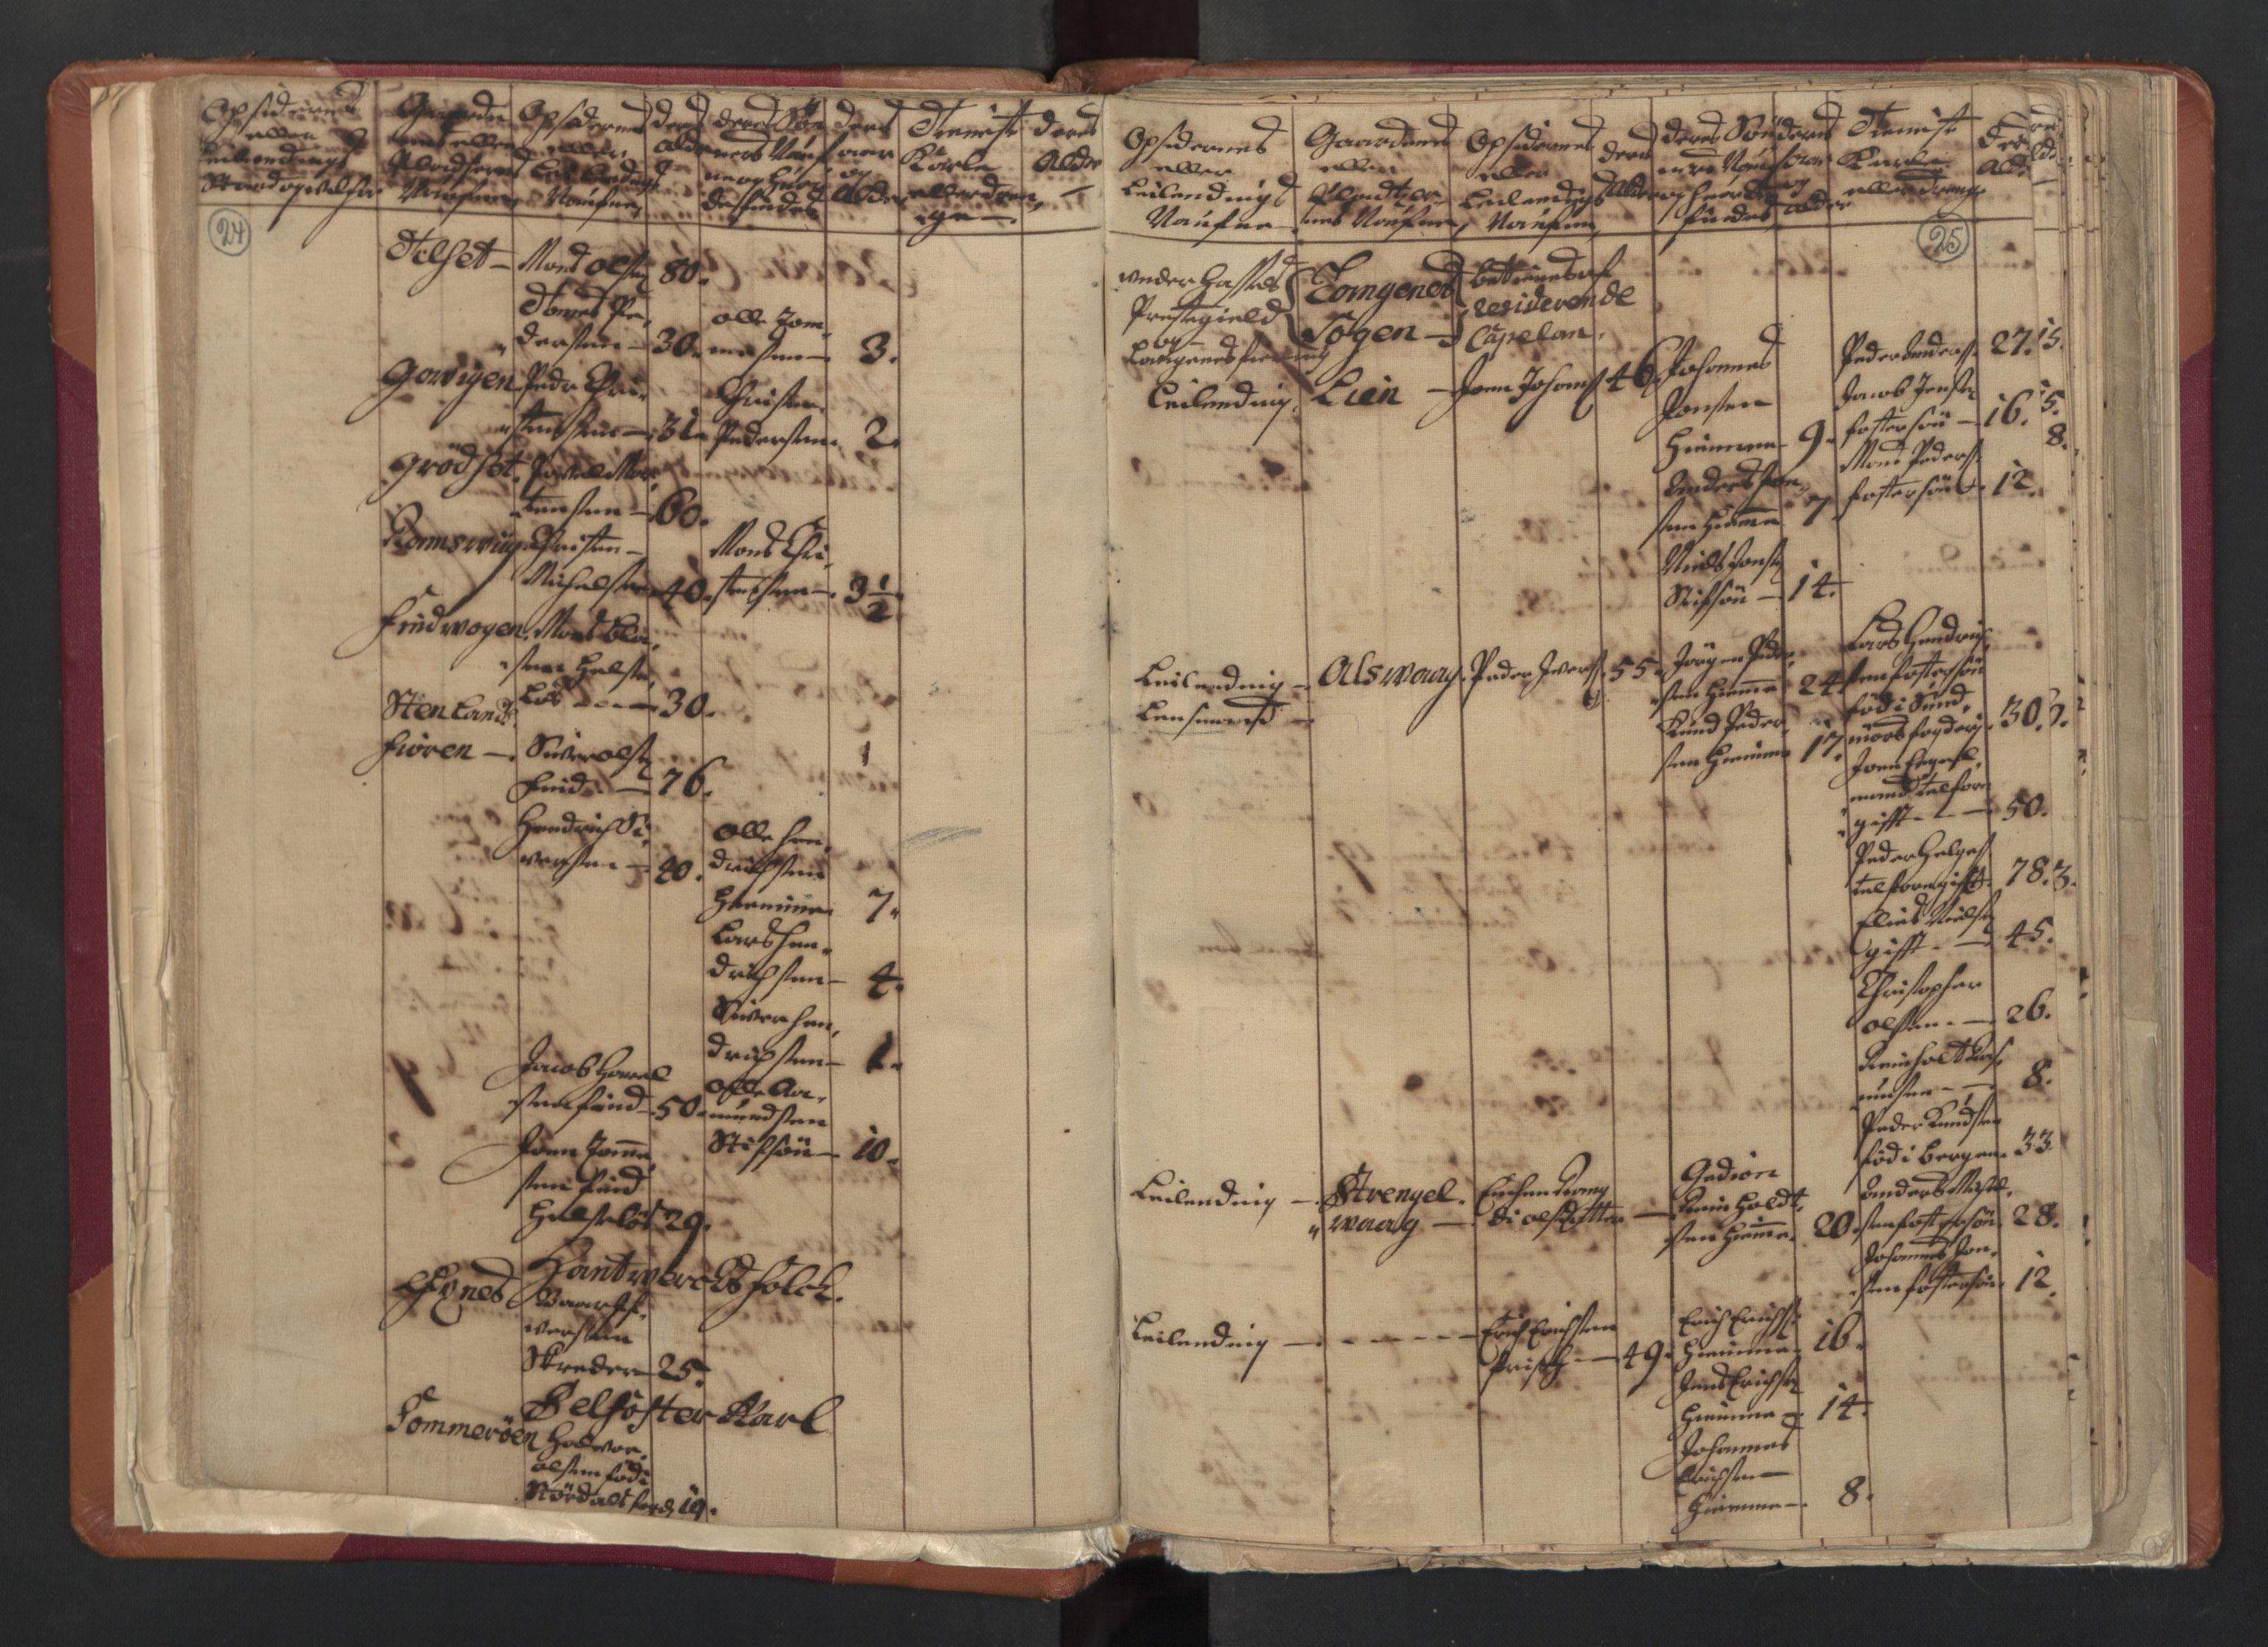 RA, Manntallet 1701, nr. 18: Vesterålen, Andenes og Lofoten fogderi, 1701, s. 24-25